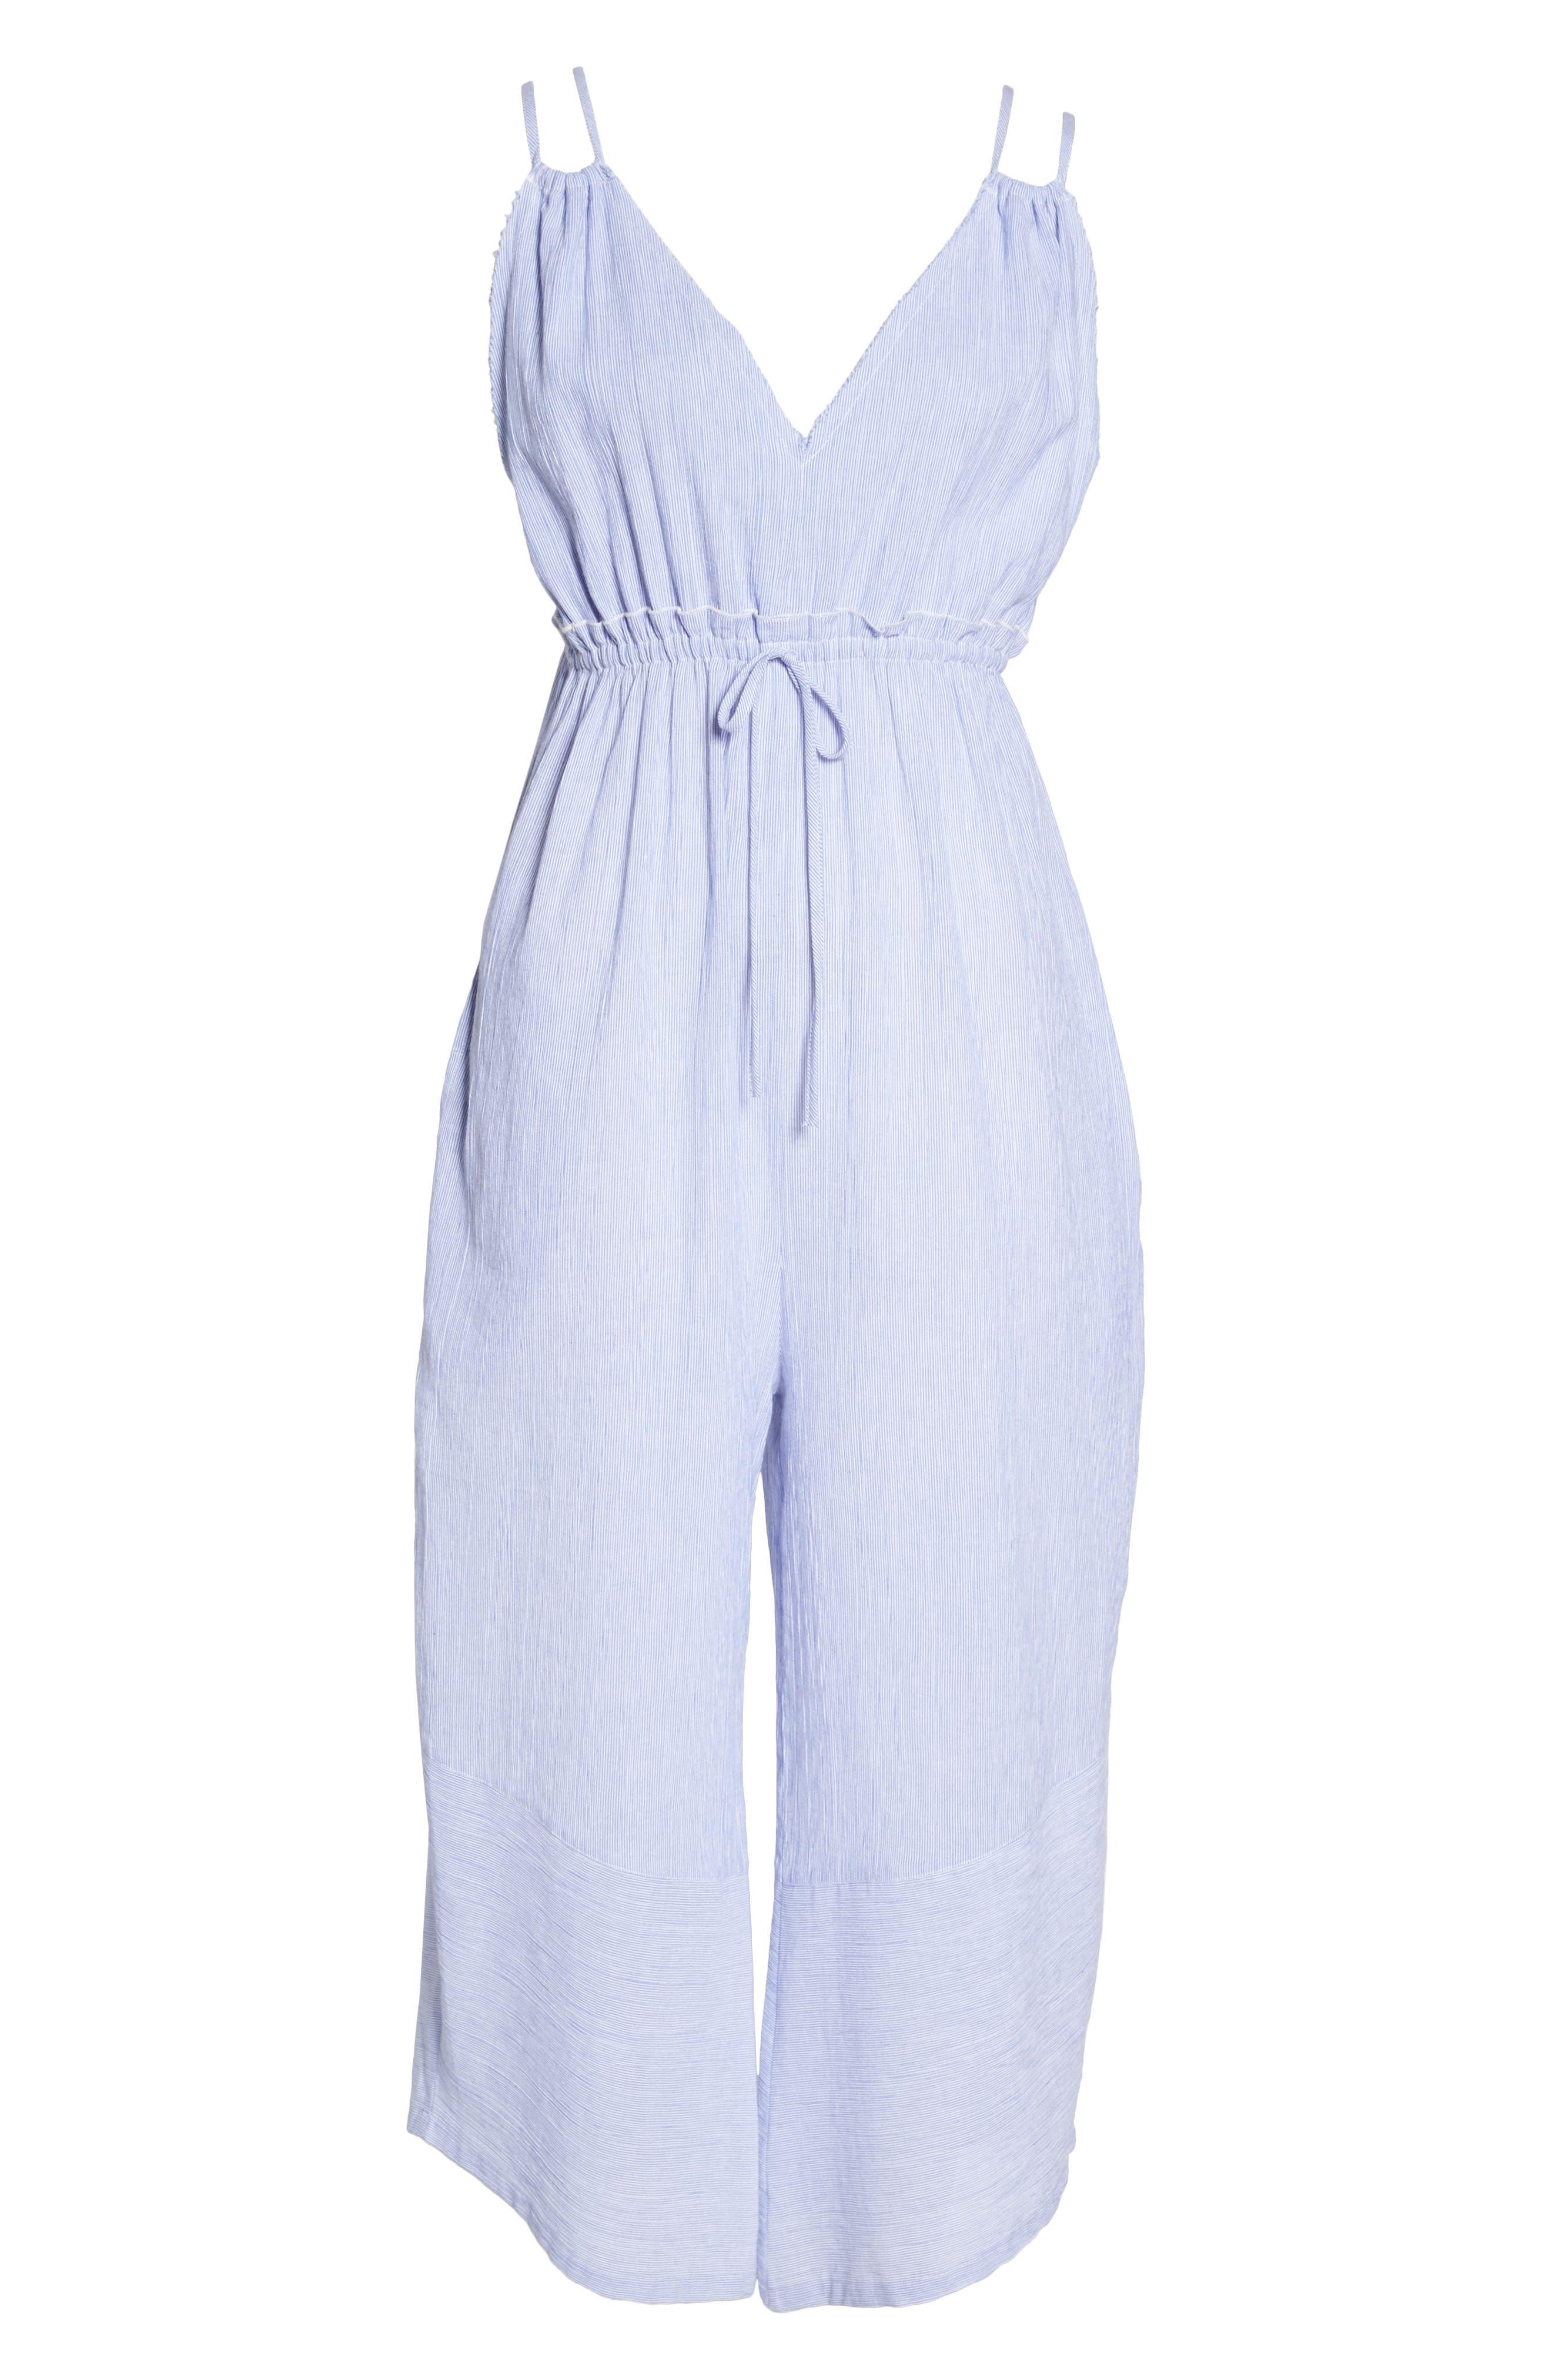 Florentina Jumpsuit Cover-Up,                             Alternate thumbnail 6, color,                             Blue/ White